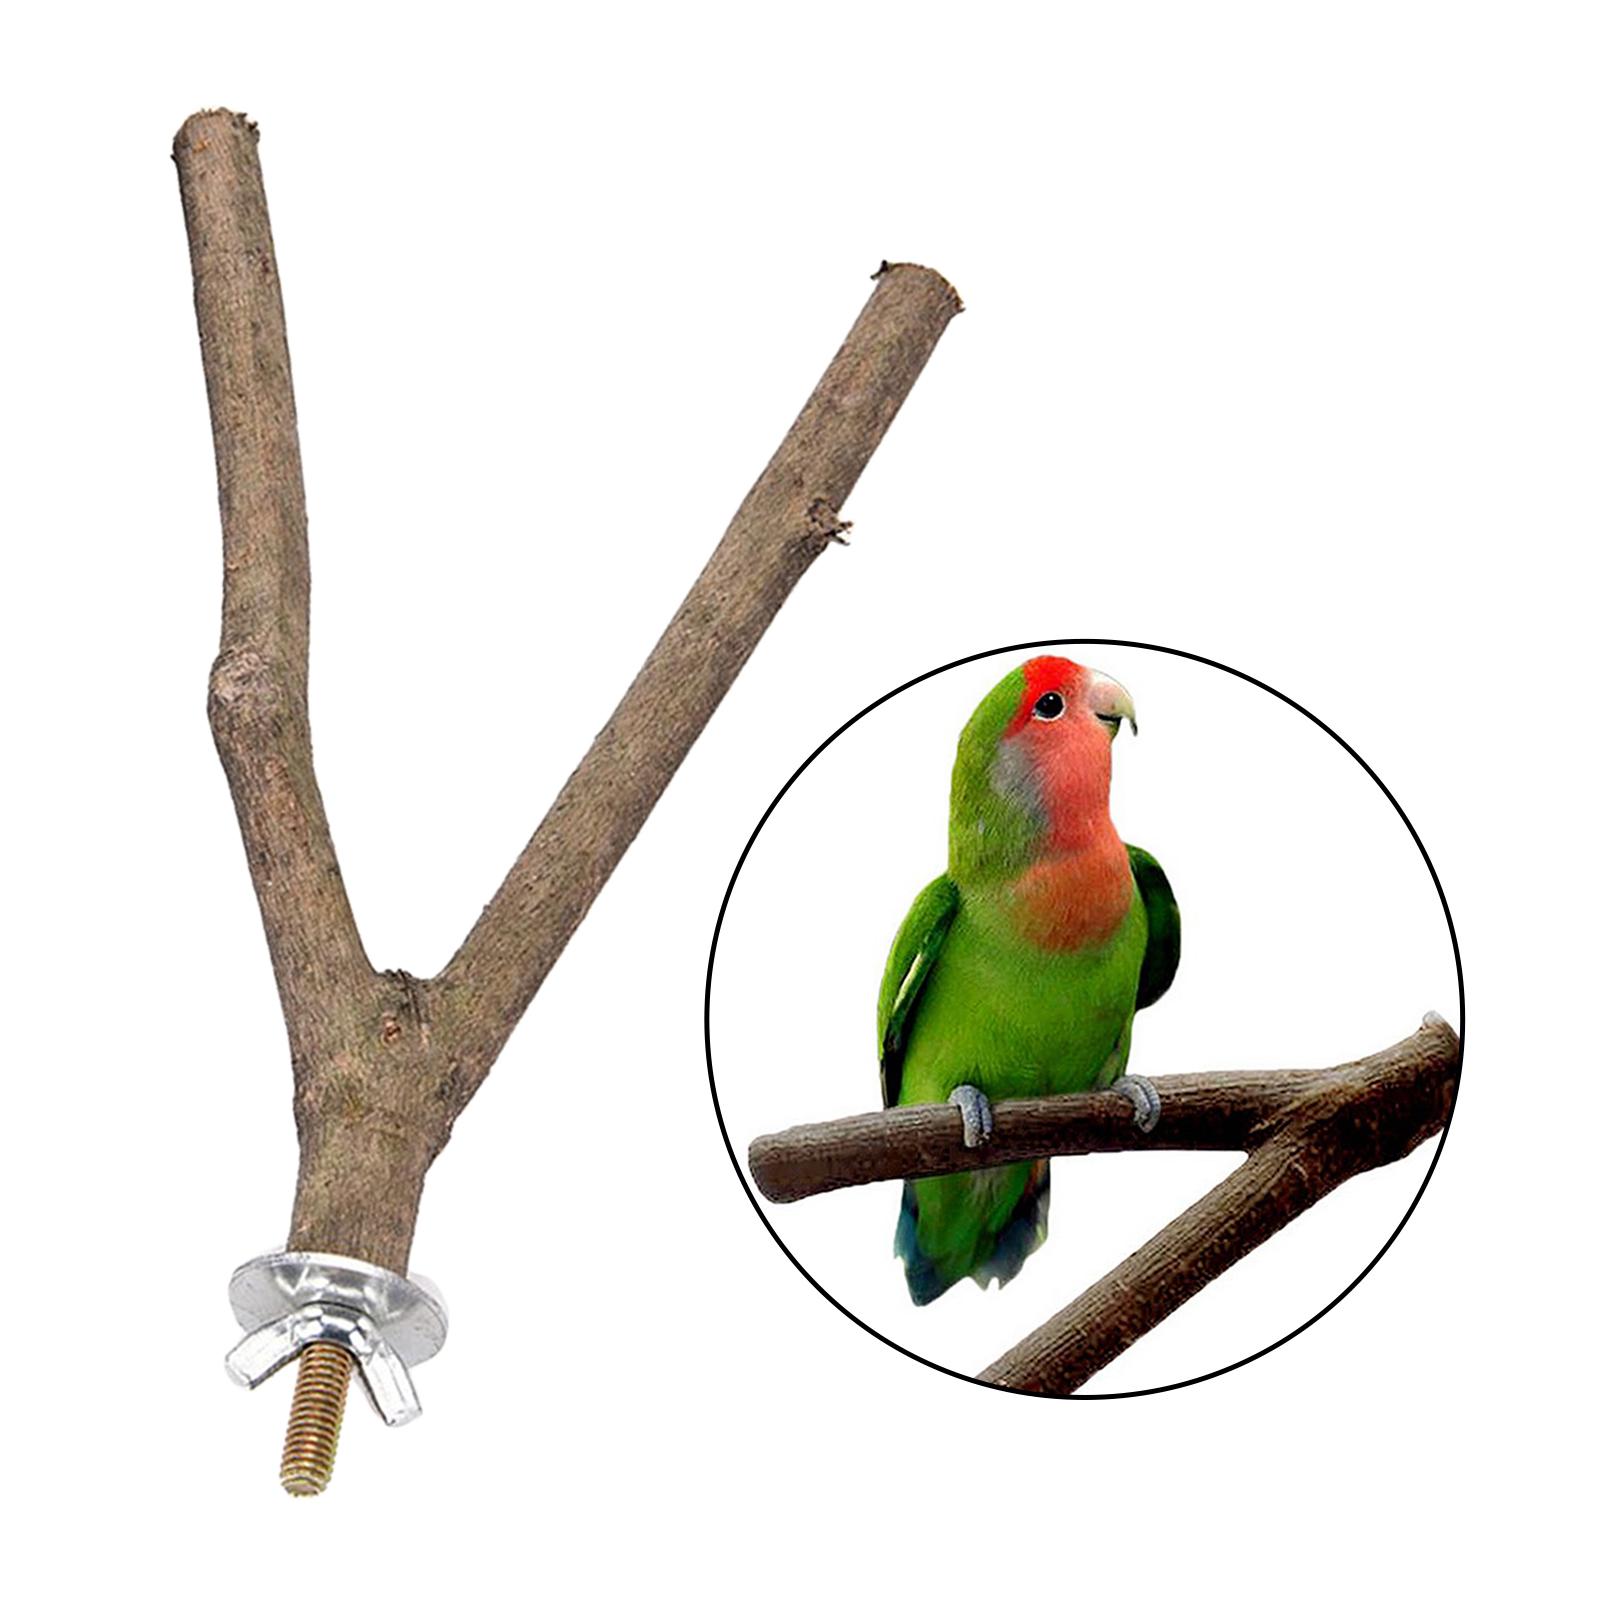 thumbnail 17 - Bird-Perch-Wood-Stand-Bird-Cage-Swing-Branch-for-Parrot-Parakeet-Cockatiel